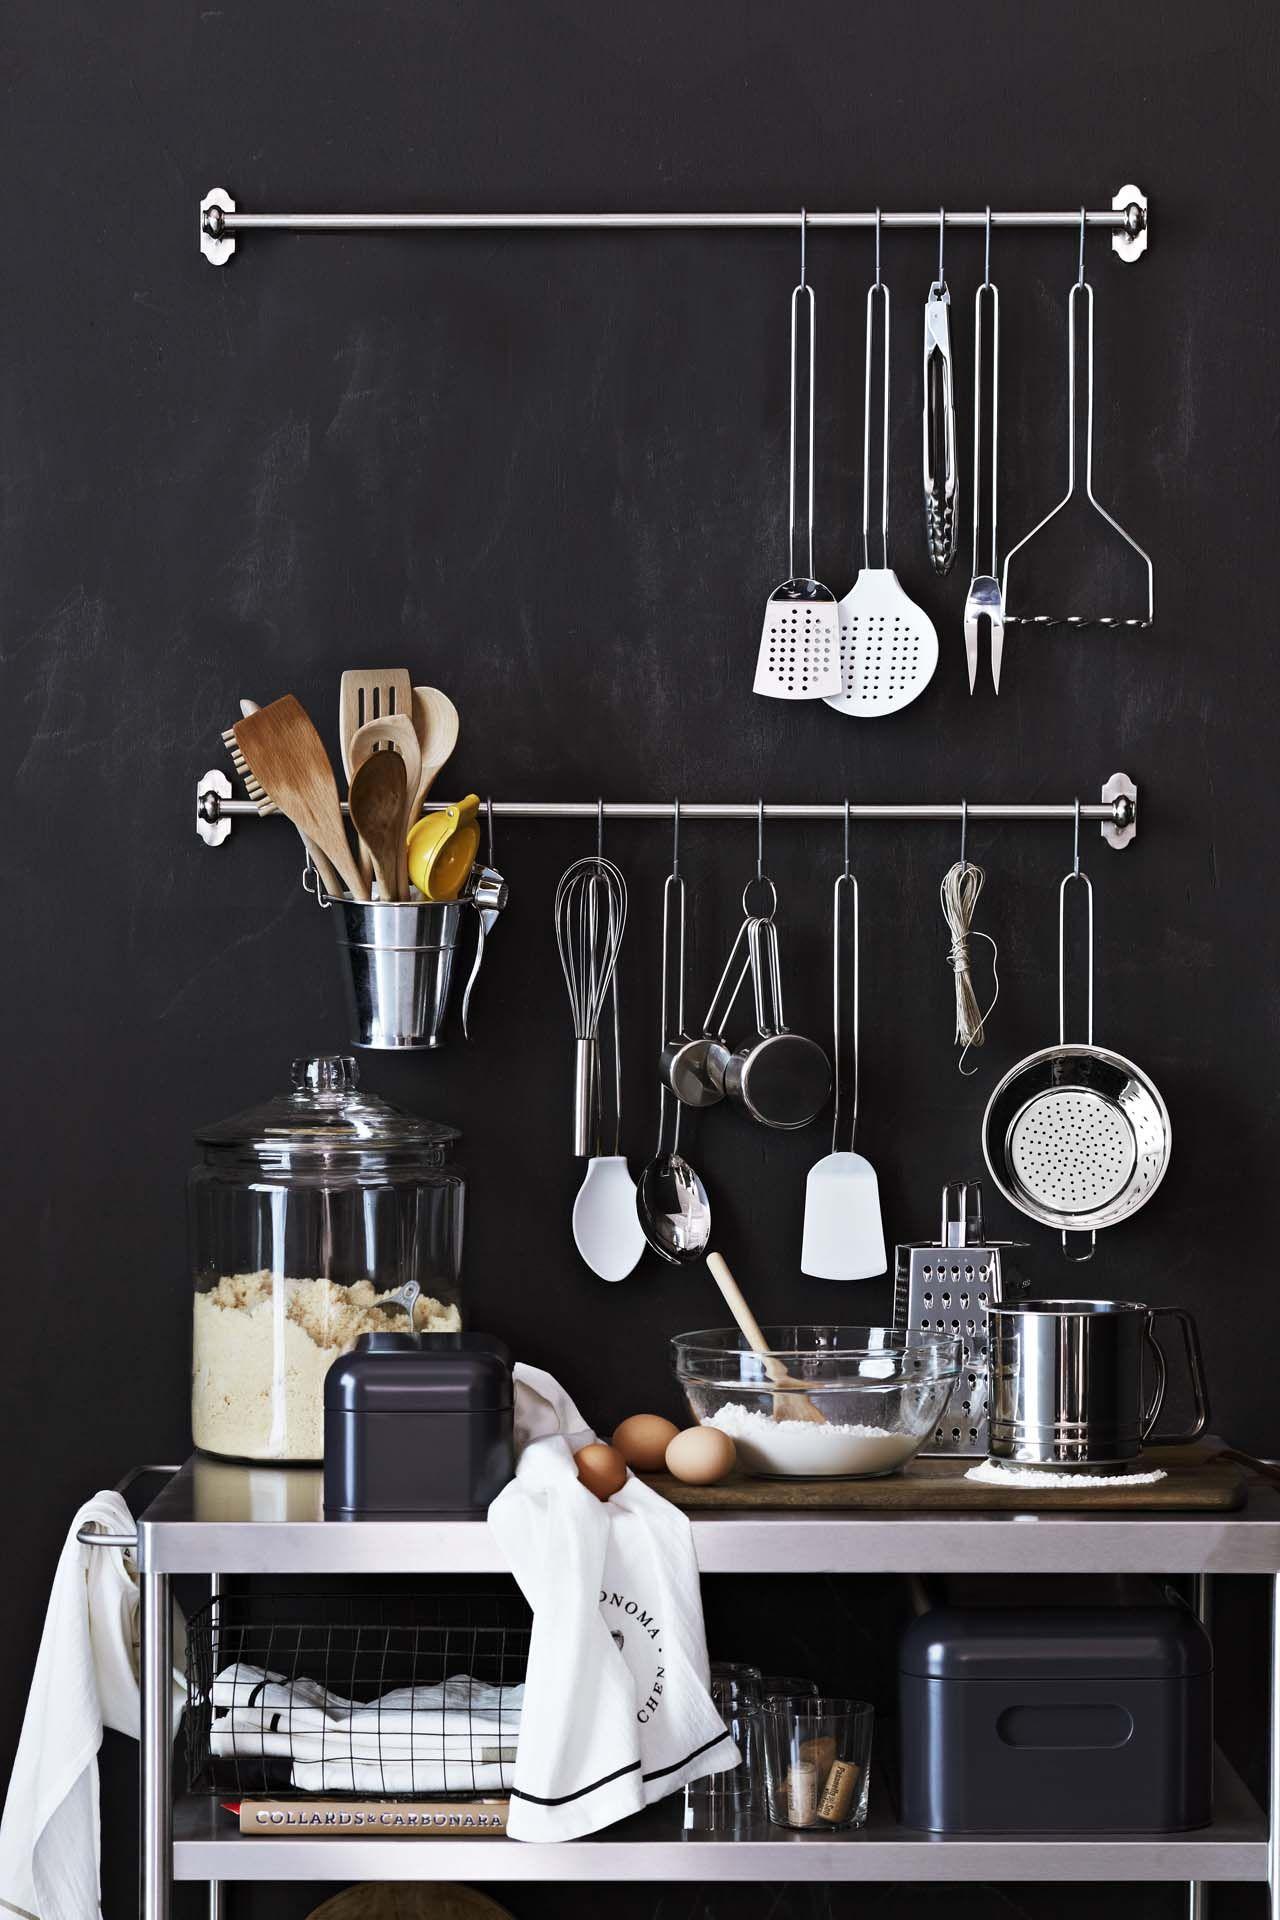 Kitchen tool organization small apartment pinterest